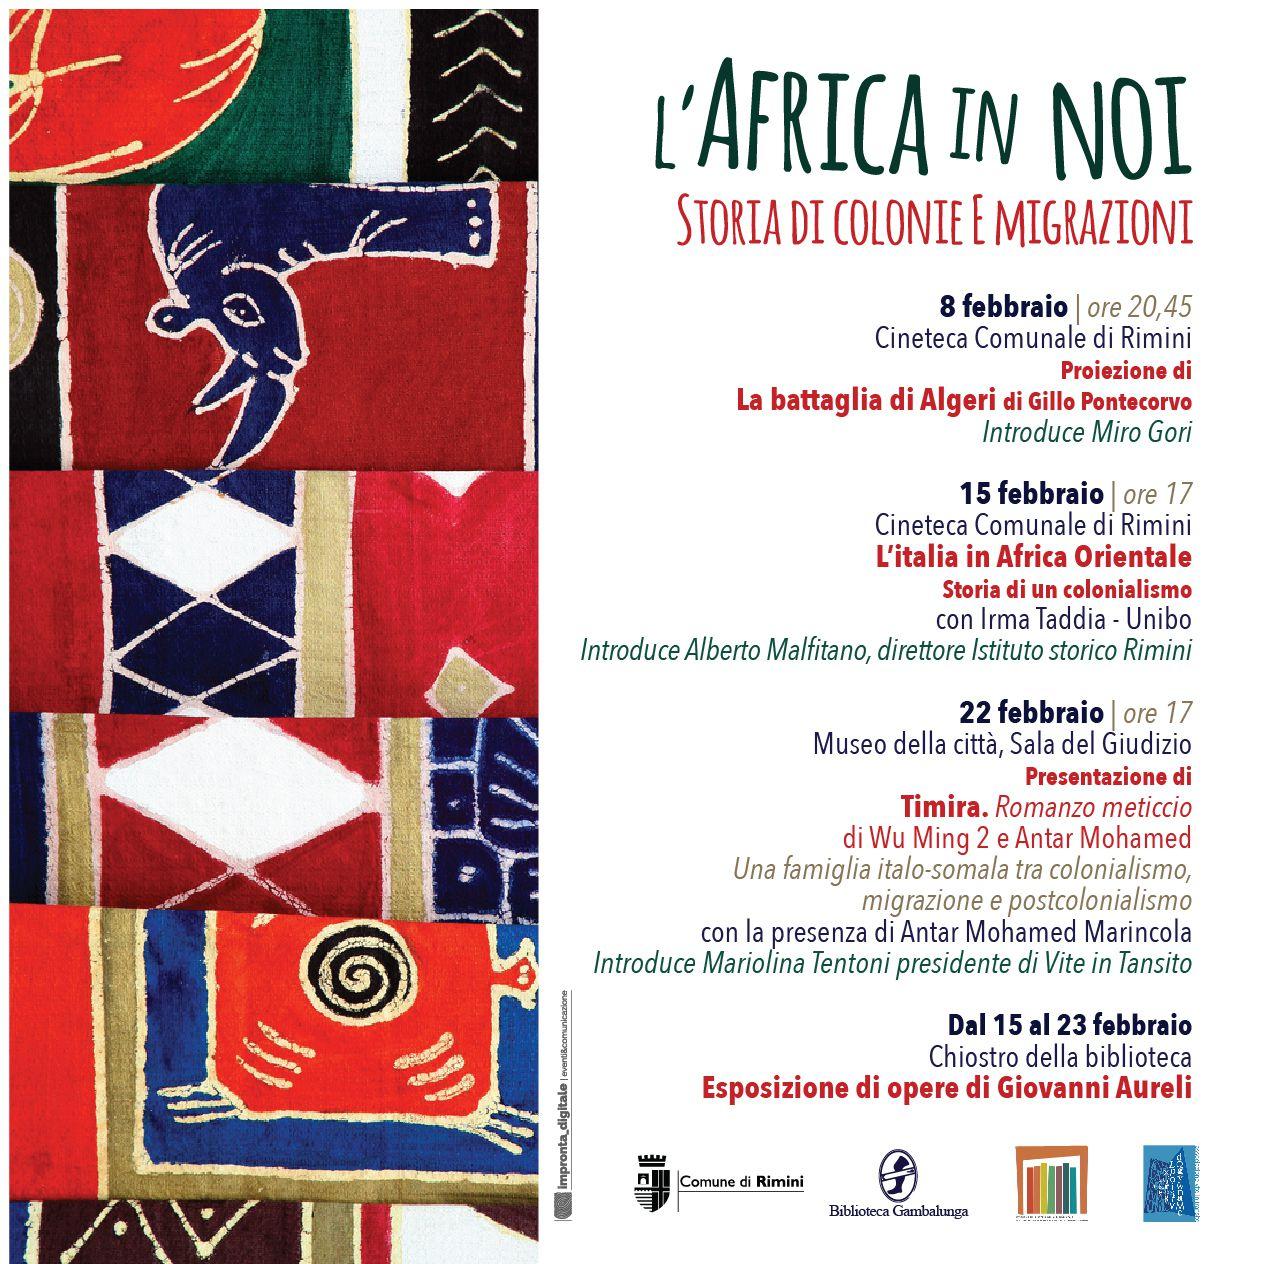 L' Africa in noi. Storie di colonie e migrazioni